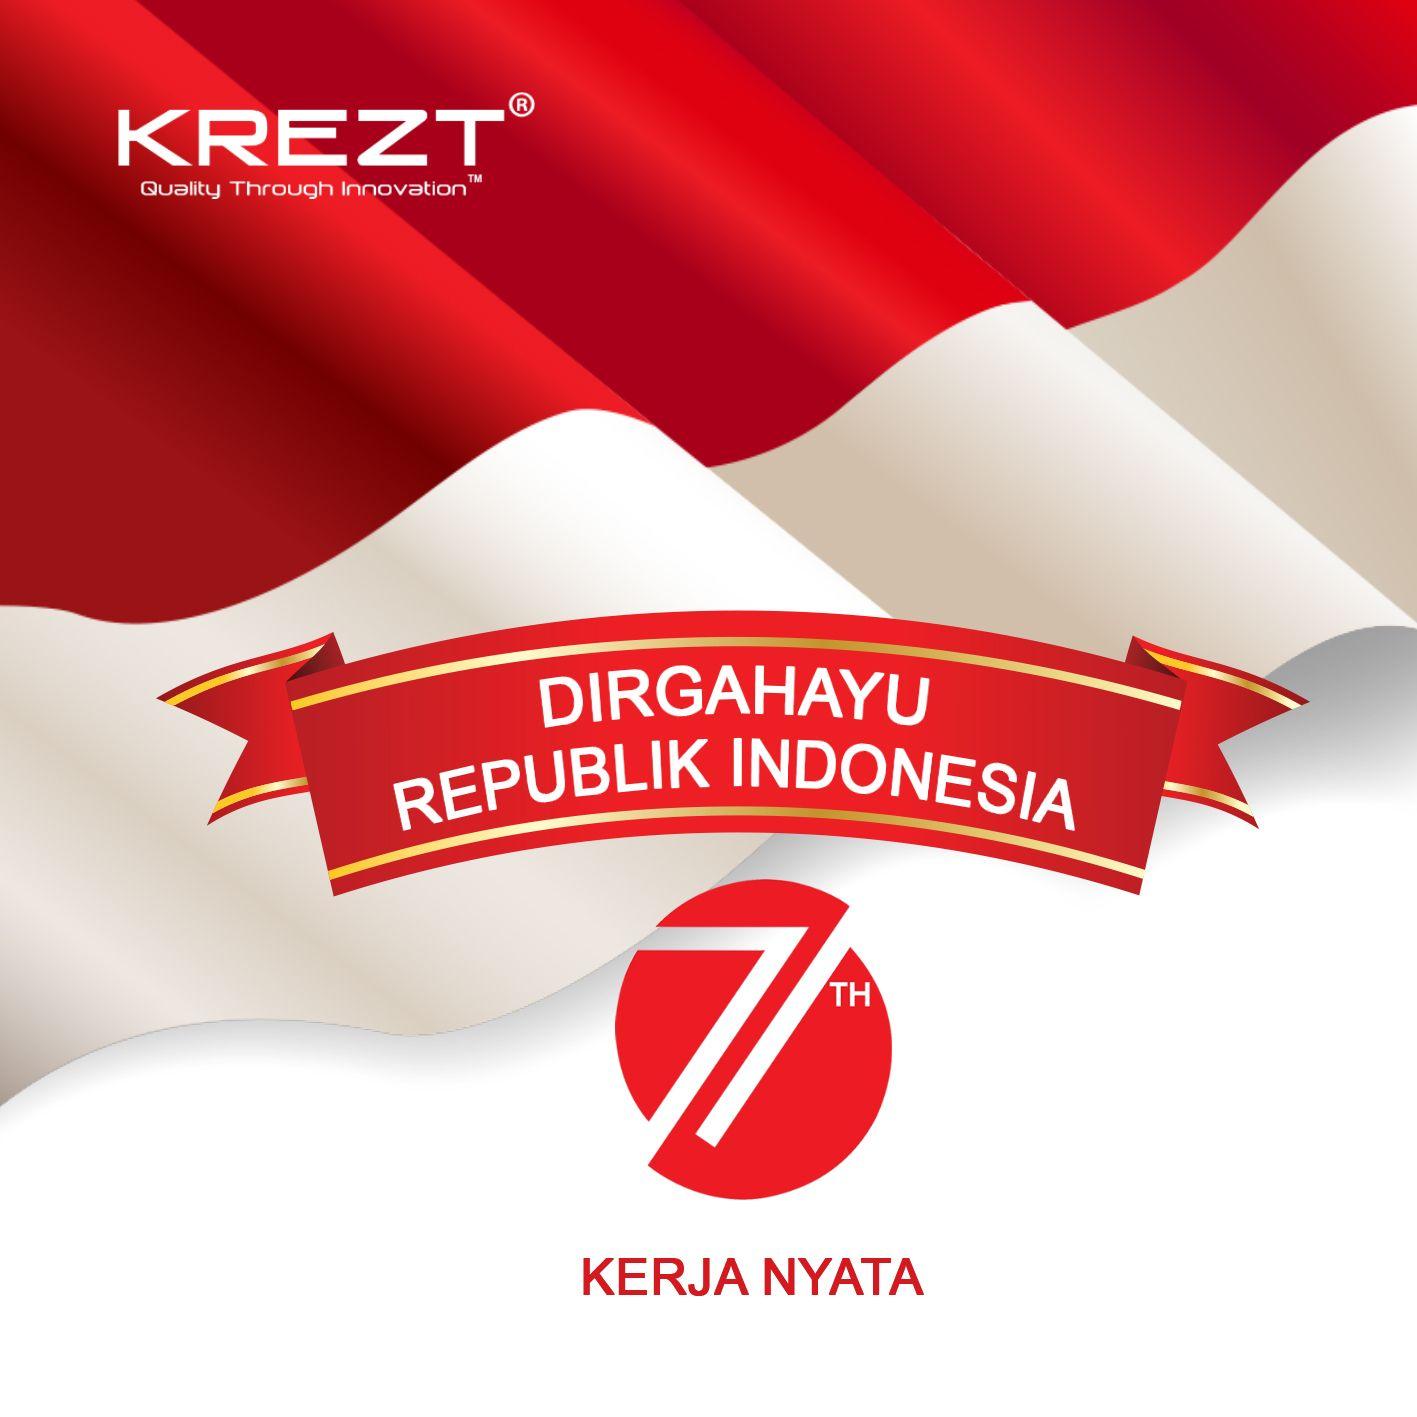 17 Agustus 45 Itulah Hari Kemerdekaan Indonesia Indonesian Republic Independence Day To 71 Years Indonesia Ind Lambang Negara Hari Kemerdekaan Indonesia